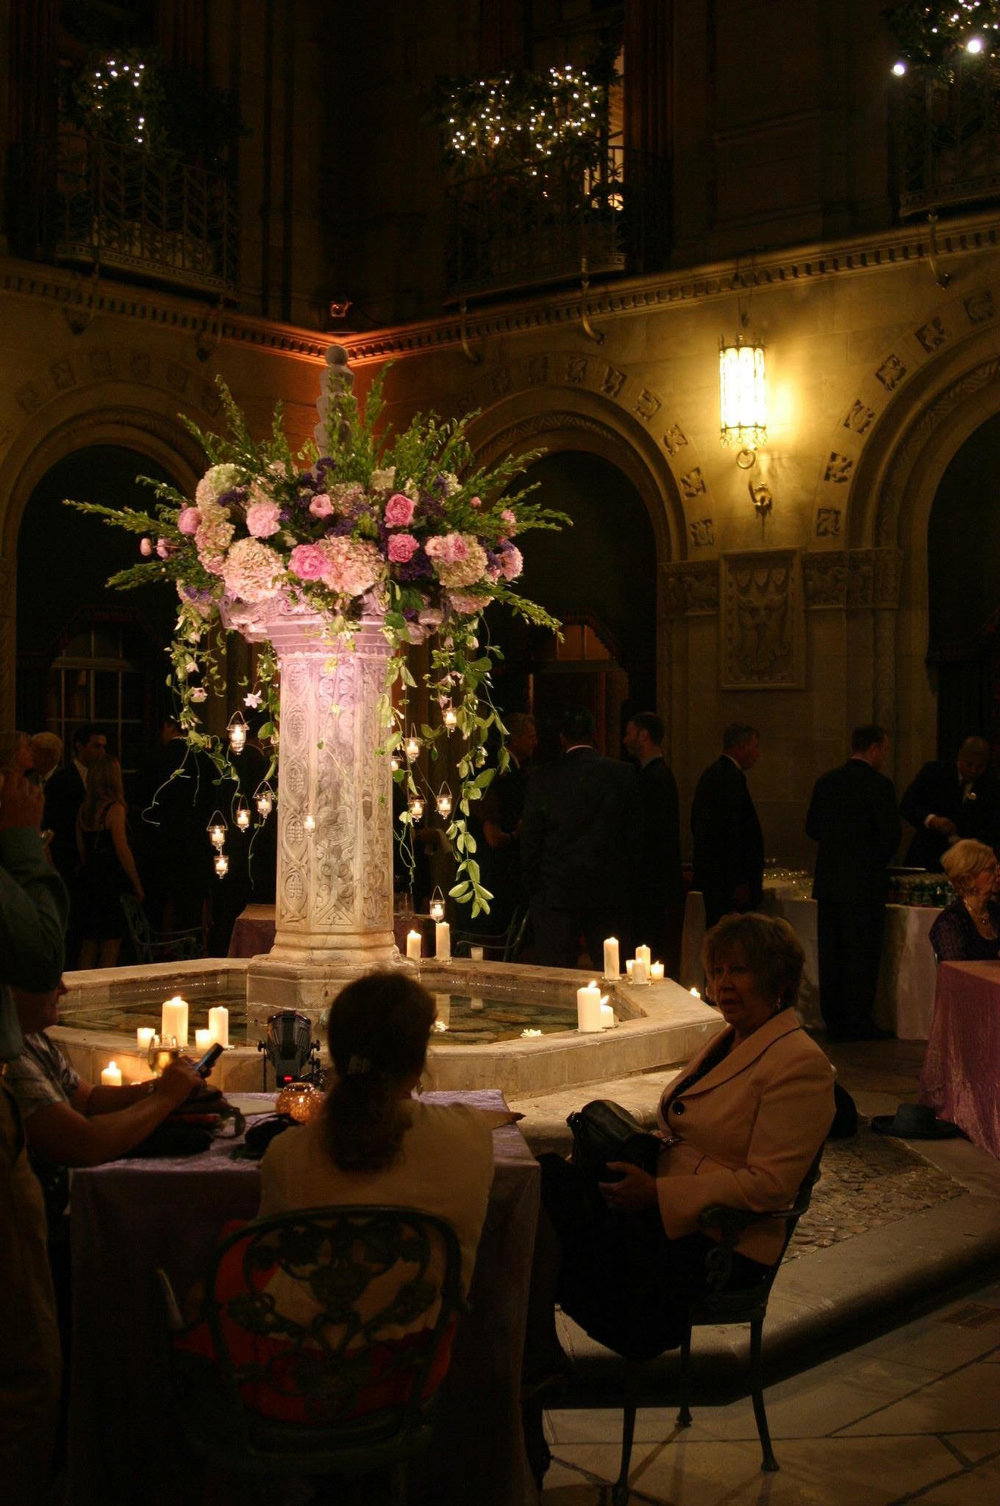 pa-pittsburgh-wedding-flowers-141.jpg